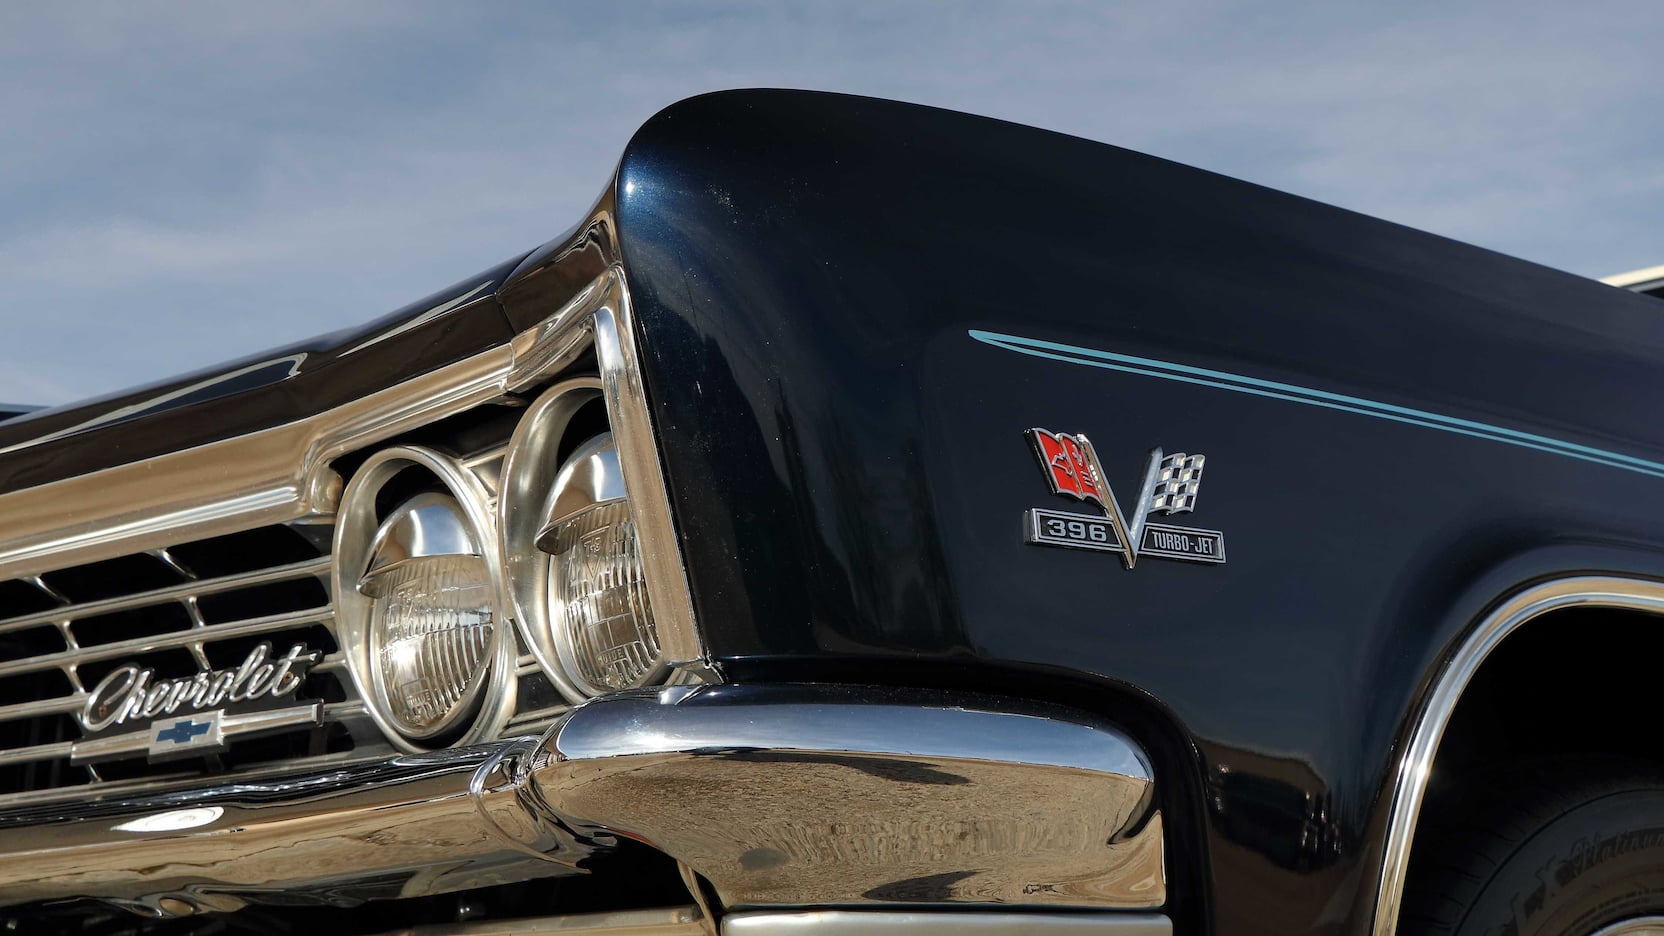 1966 Chevrolet Caprice detail